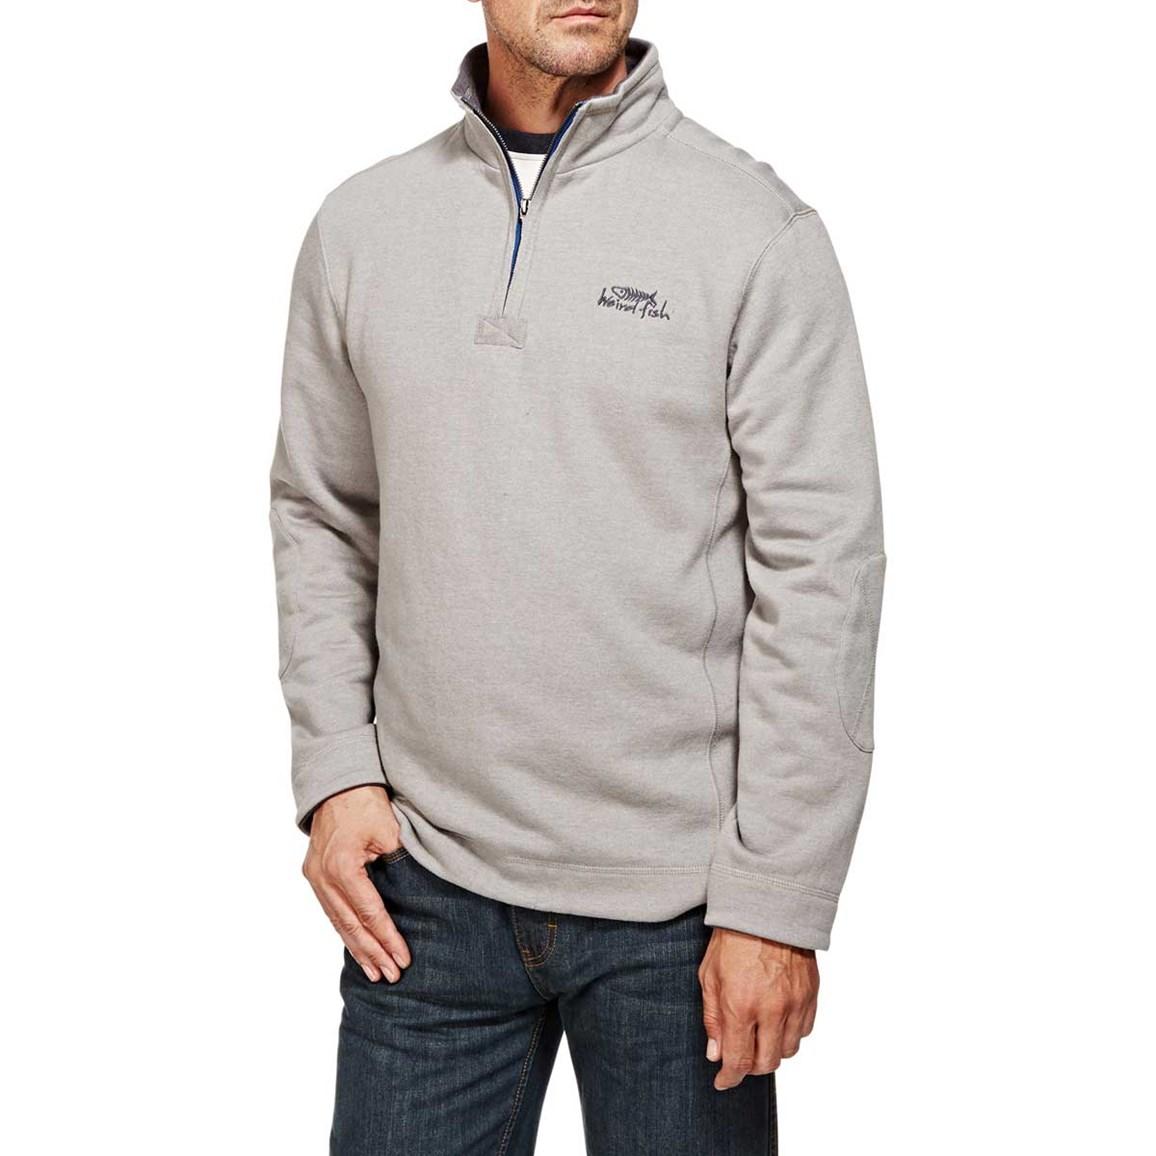 Image of Weird Fish Hail Plain 1/4 Zip Embroidered Sweatshirt Frost Grey Size 3XL